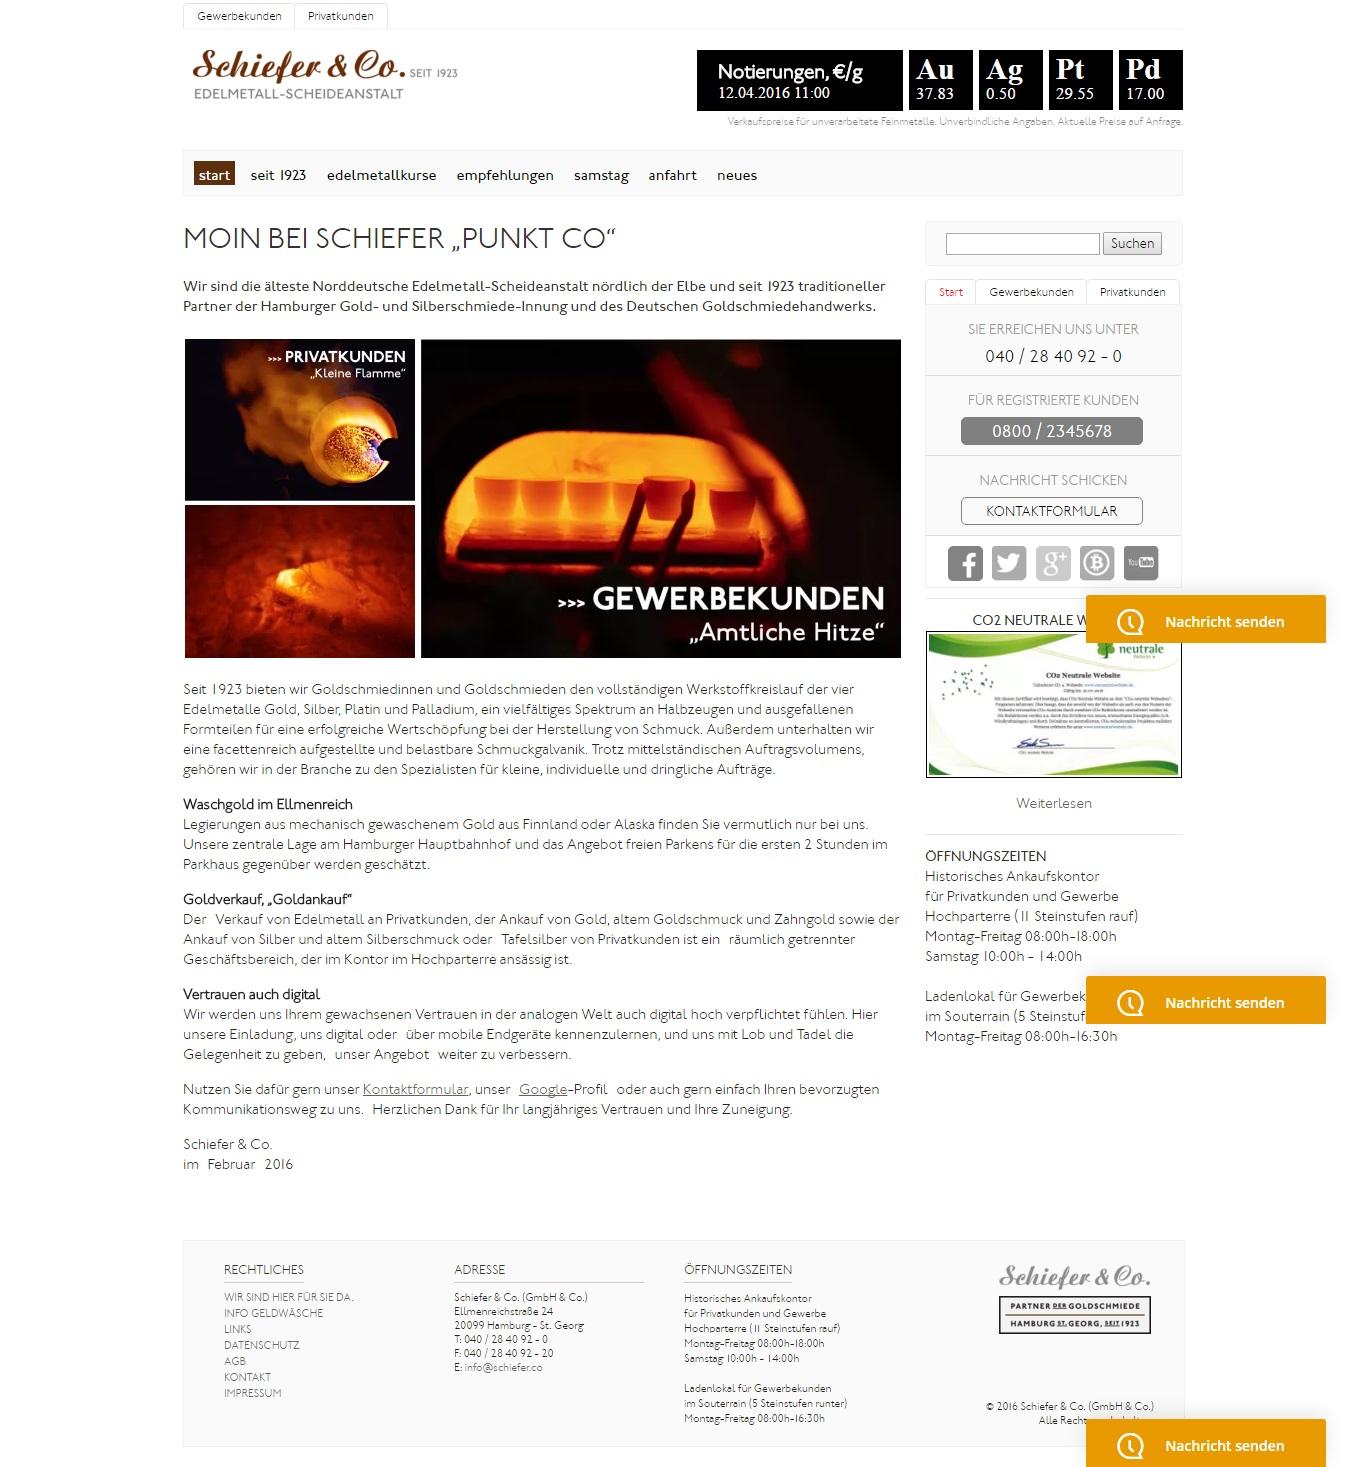 Ценные металлы. Мастерская Schiefer & Co